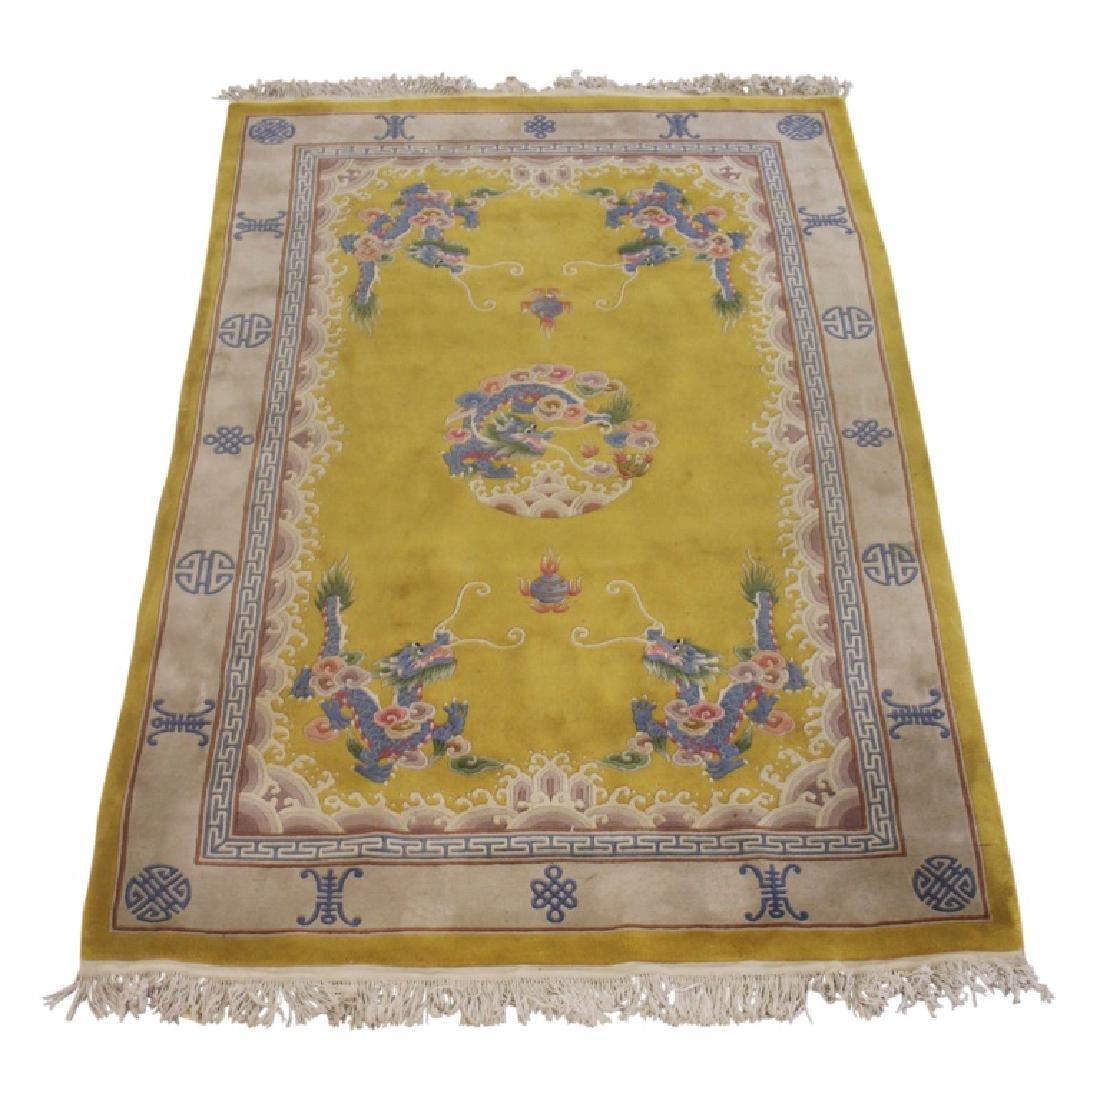 Handmade Asian Carpet 302-4